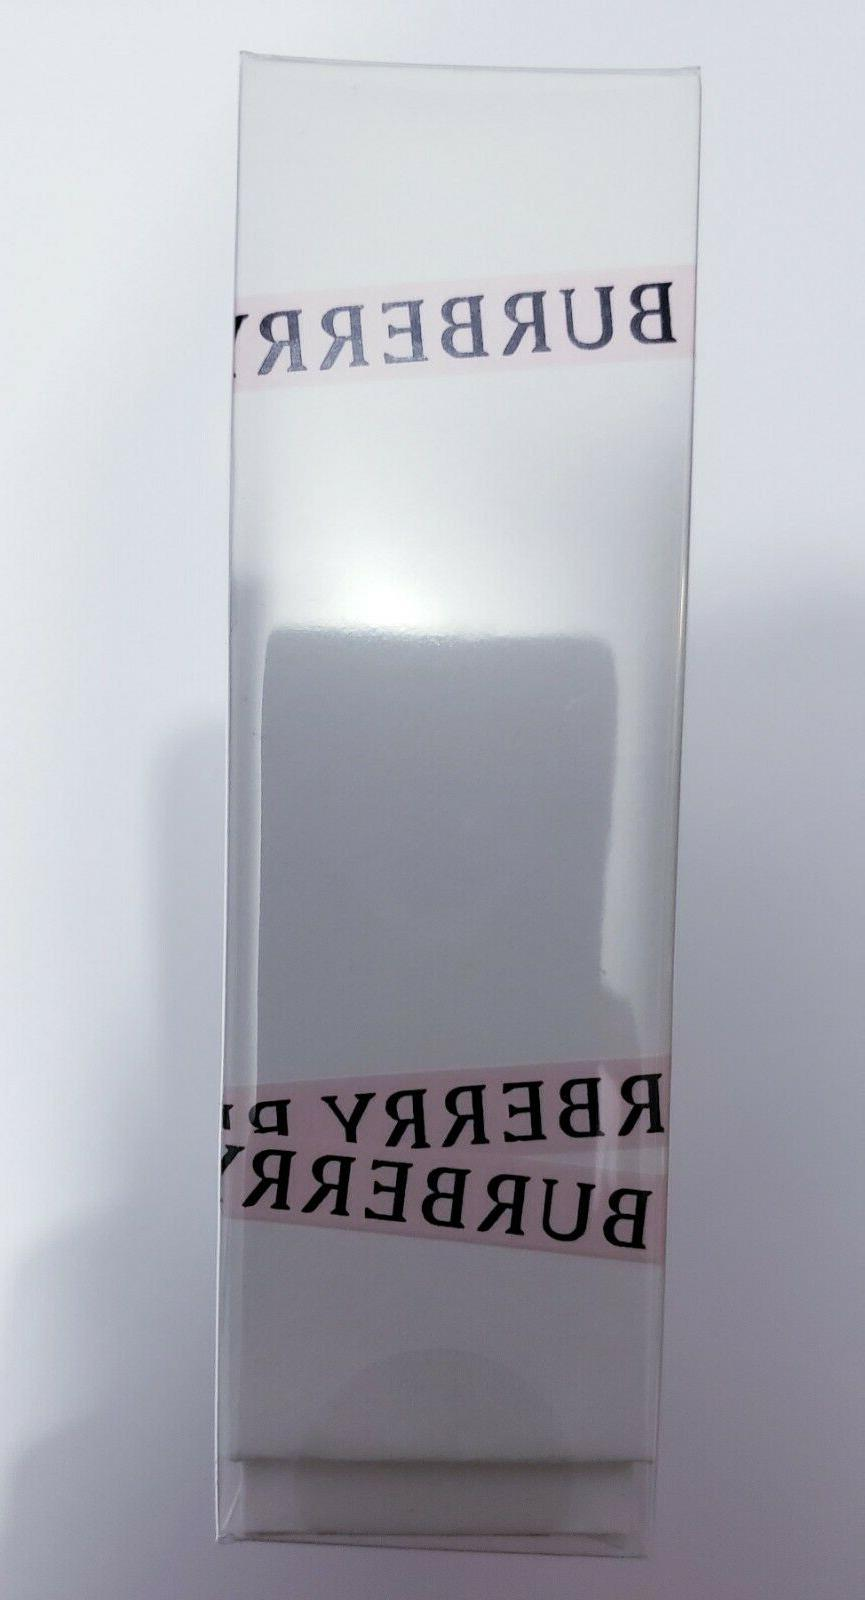 BURBERRY HER PARFUM NAT. 100 ml e 3.3 FL.OZ-BRAND NEW 100%AUTHENTIC